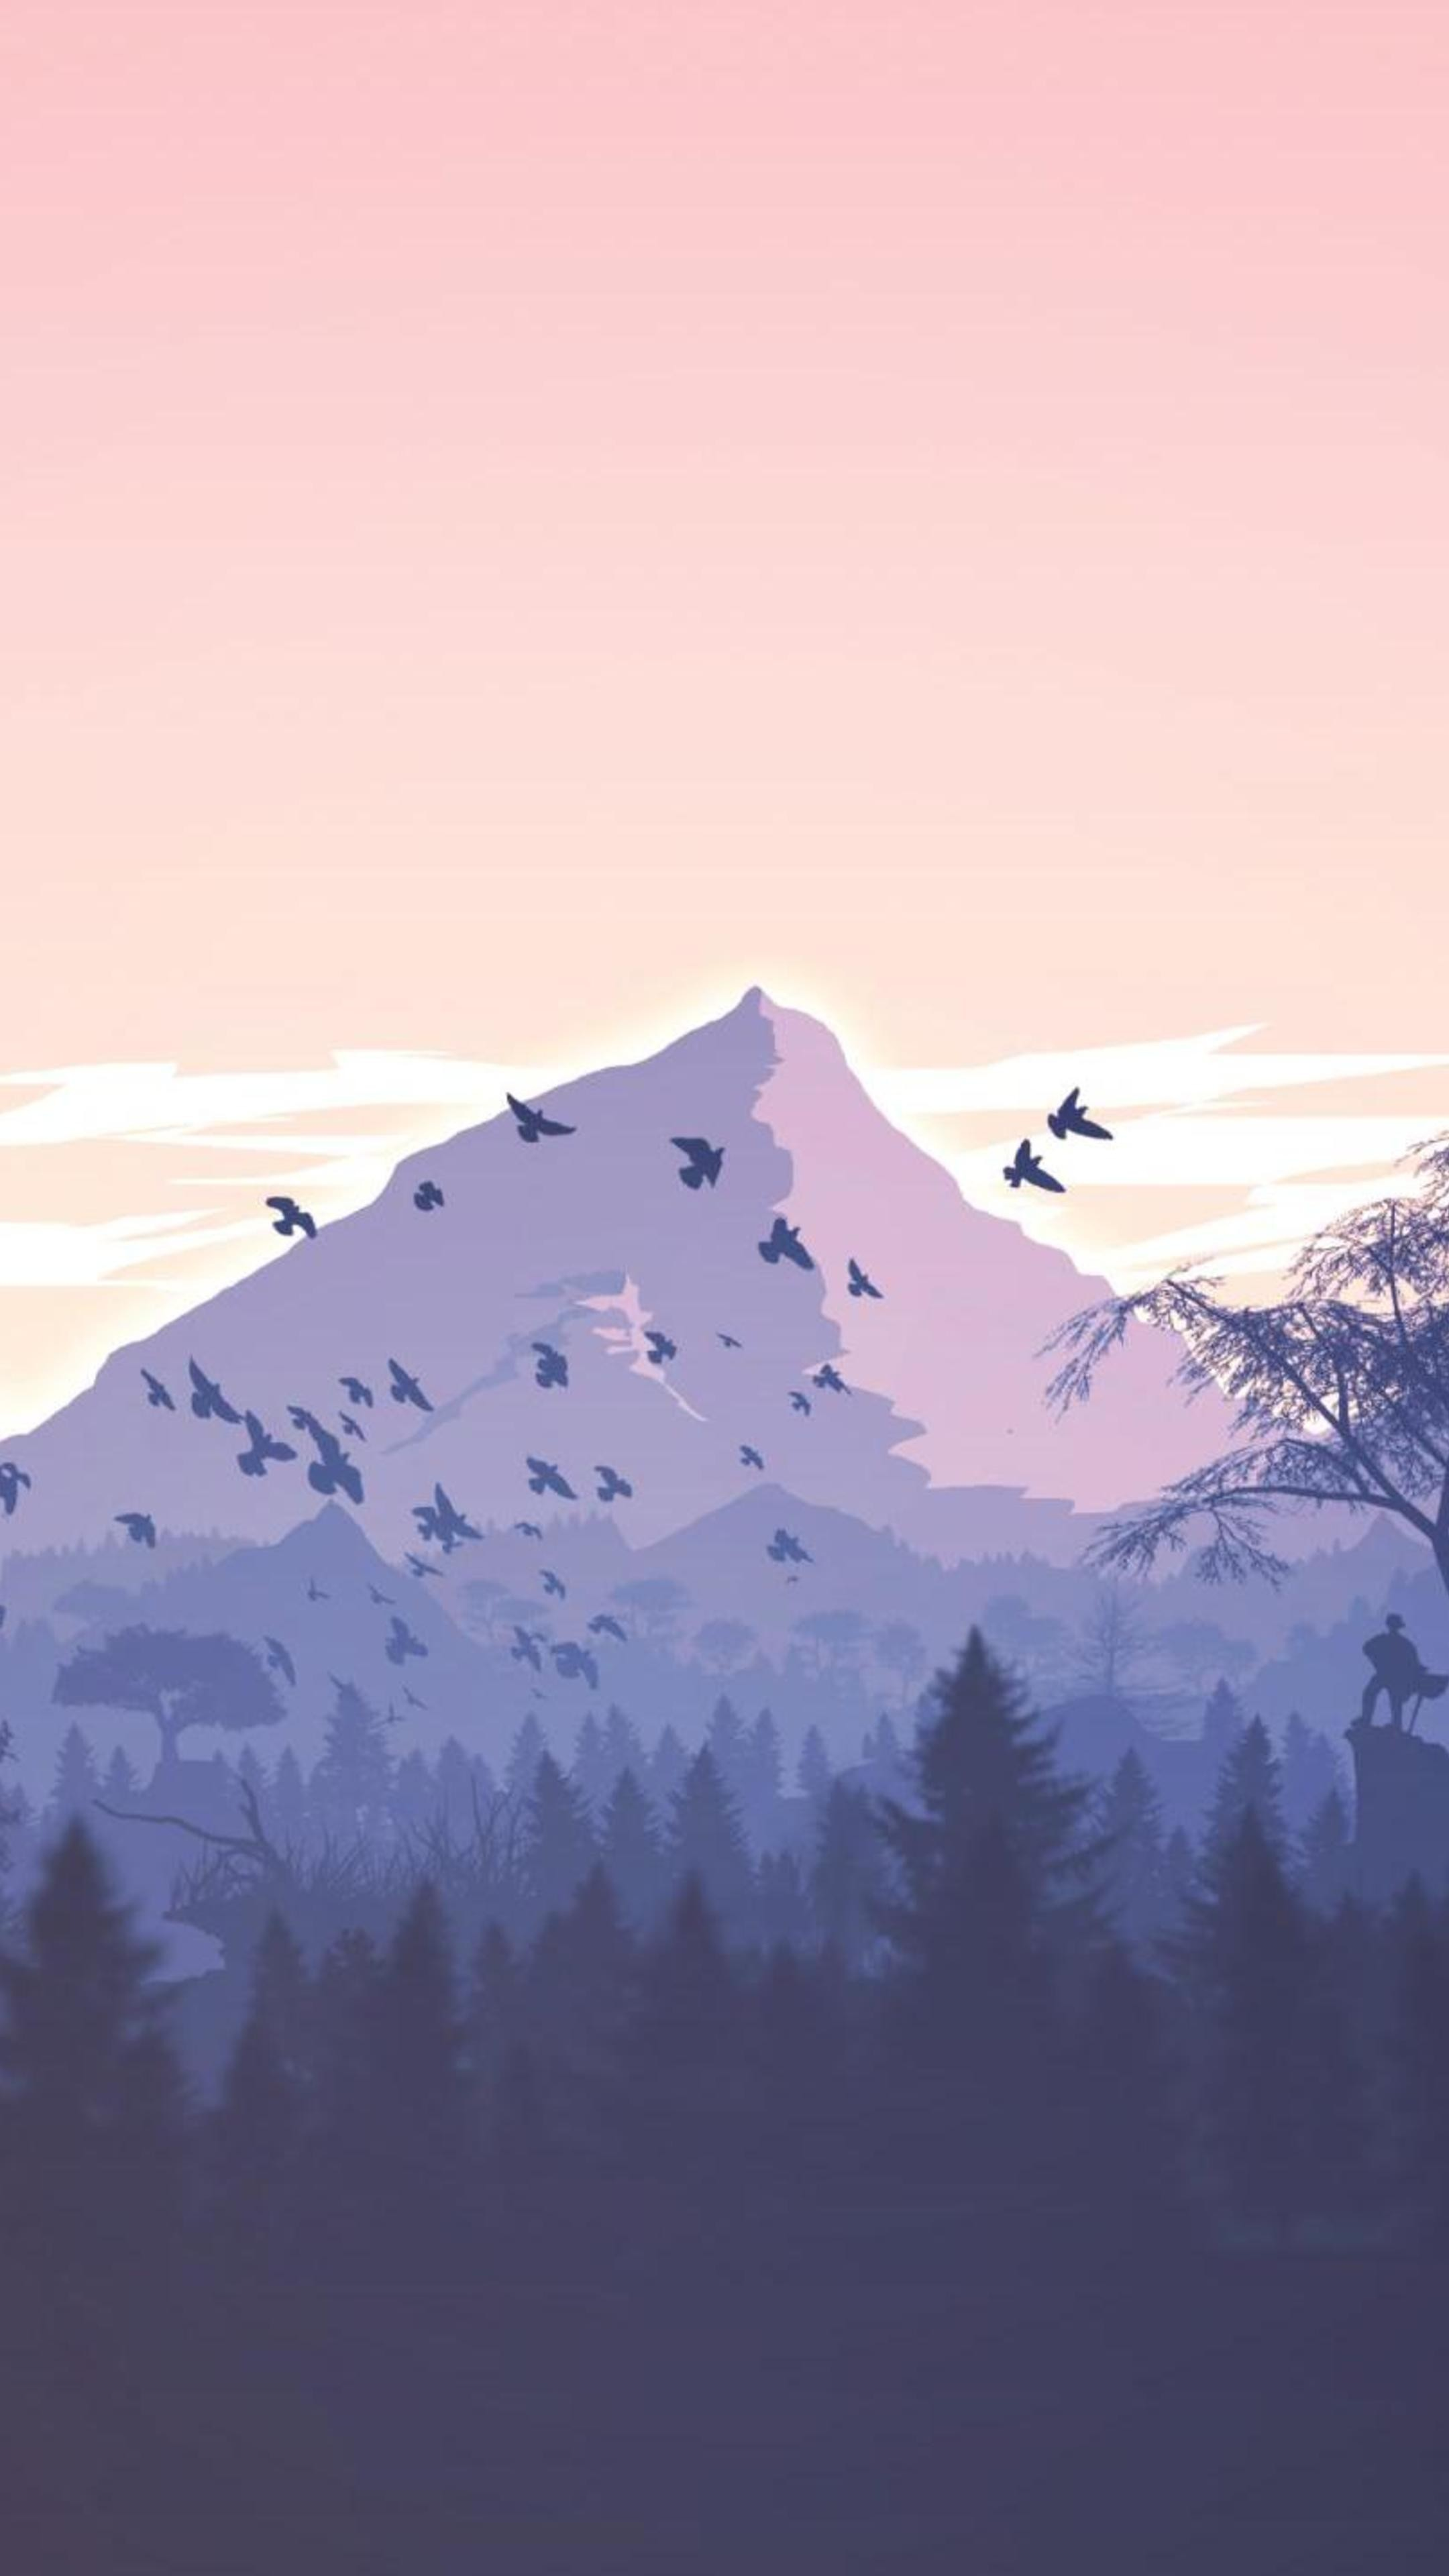 Minimalism Birds Mountains Trees Forest 9k Wallpaper